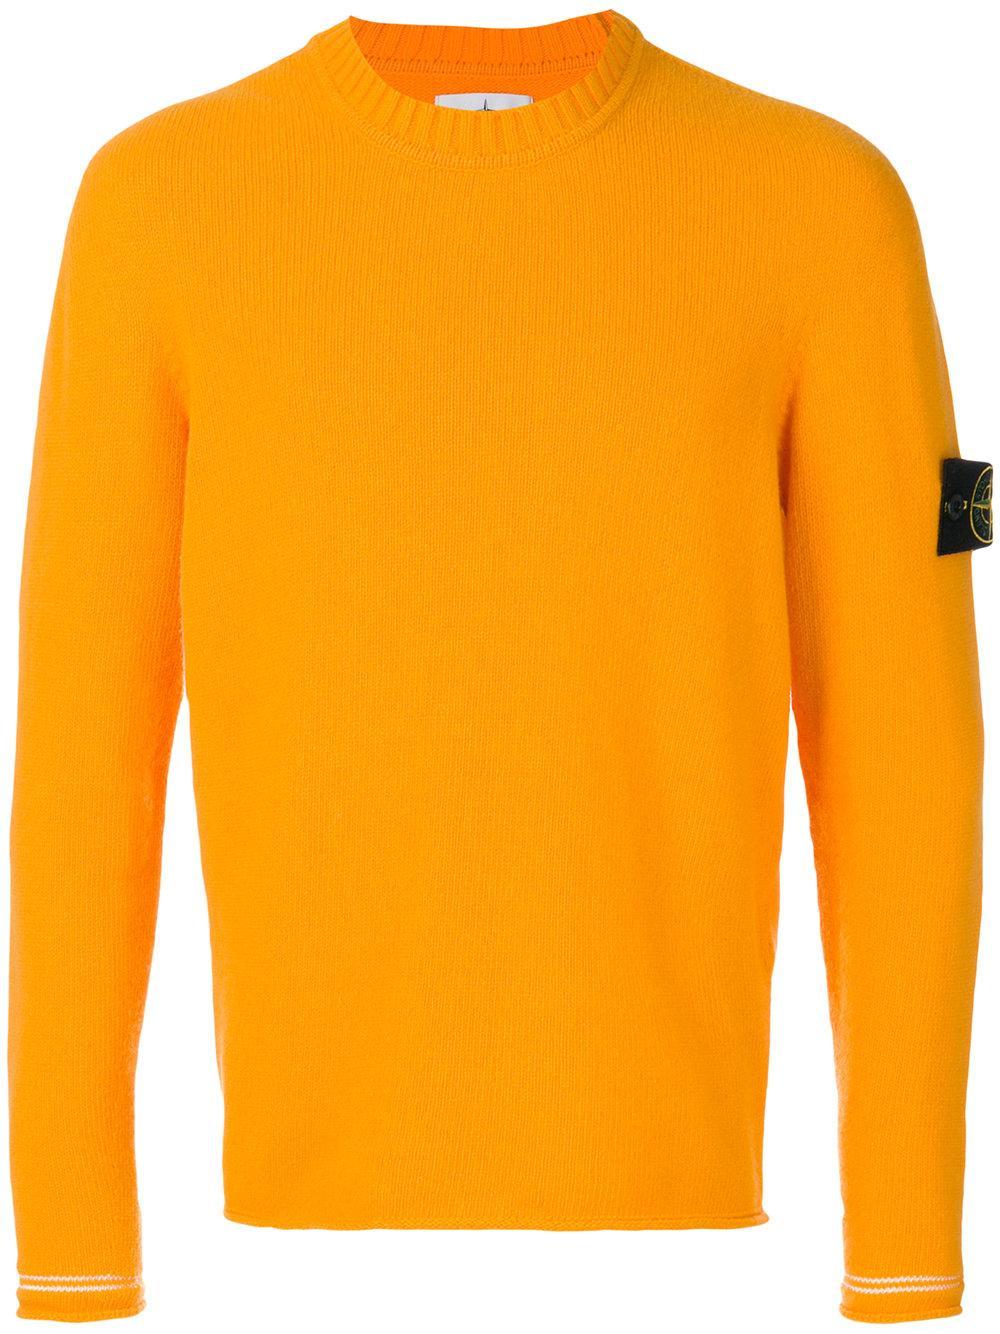 stone island long sleeve pullover in orange for men lyst. Black Bedroom Furniture Sets. Home Design Ideas